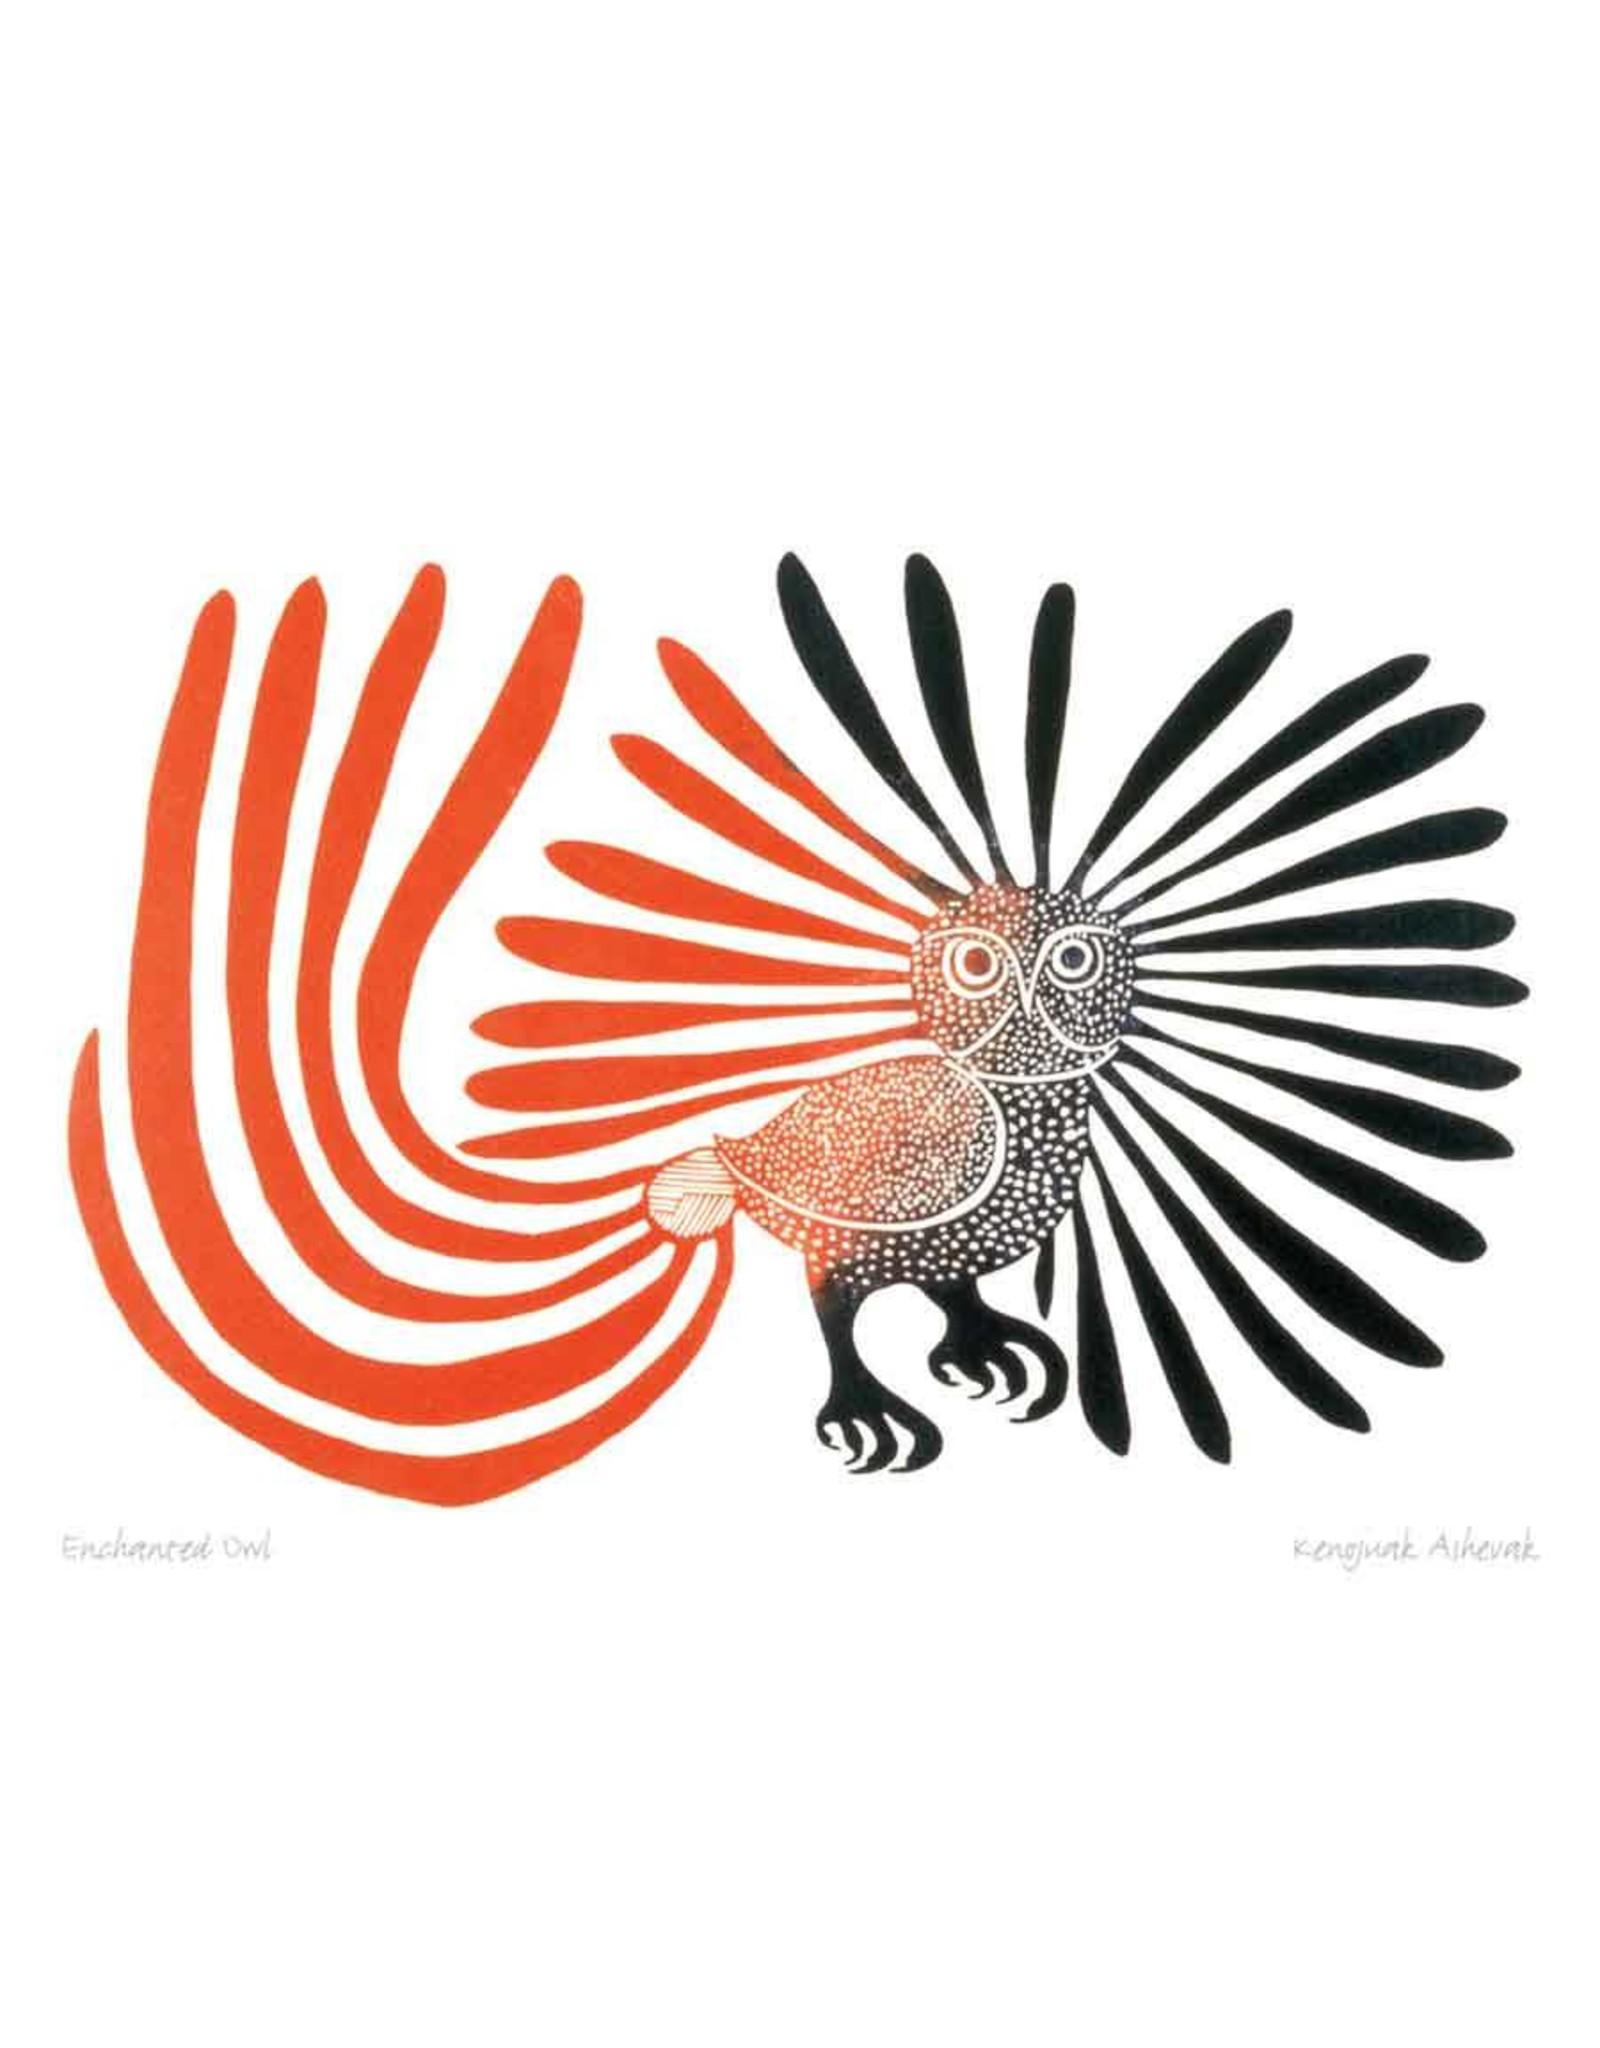 Enchanted Owl par Kenojuak Ashevak Encadrée